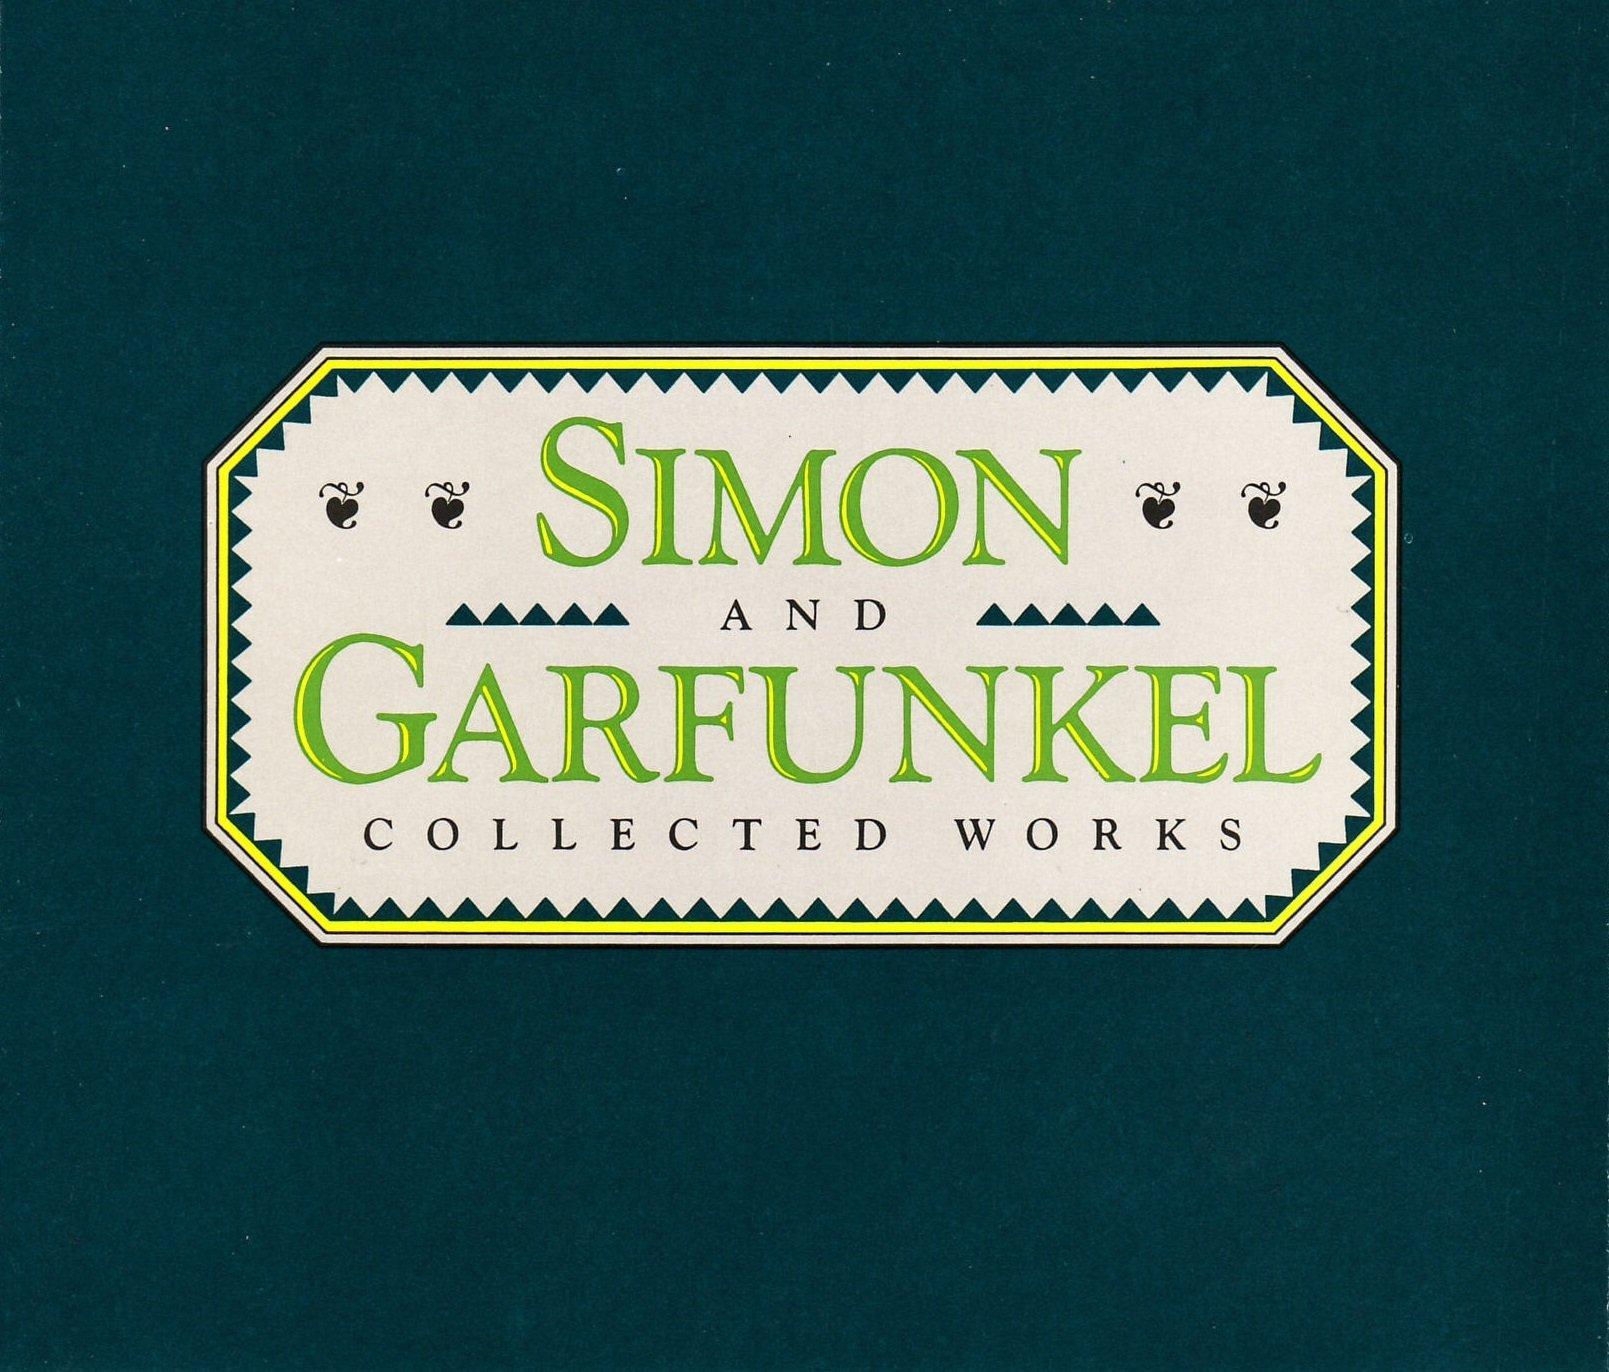 Simon And Garfunkel Greatest Hits